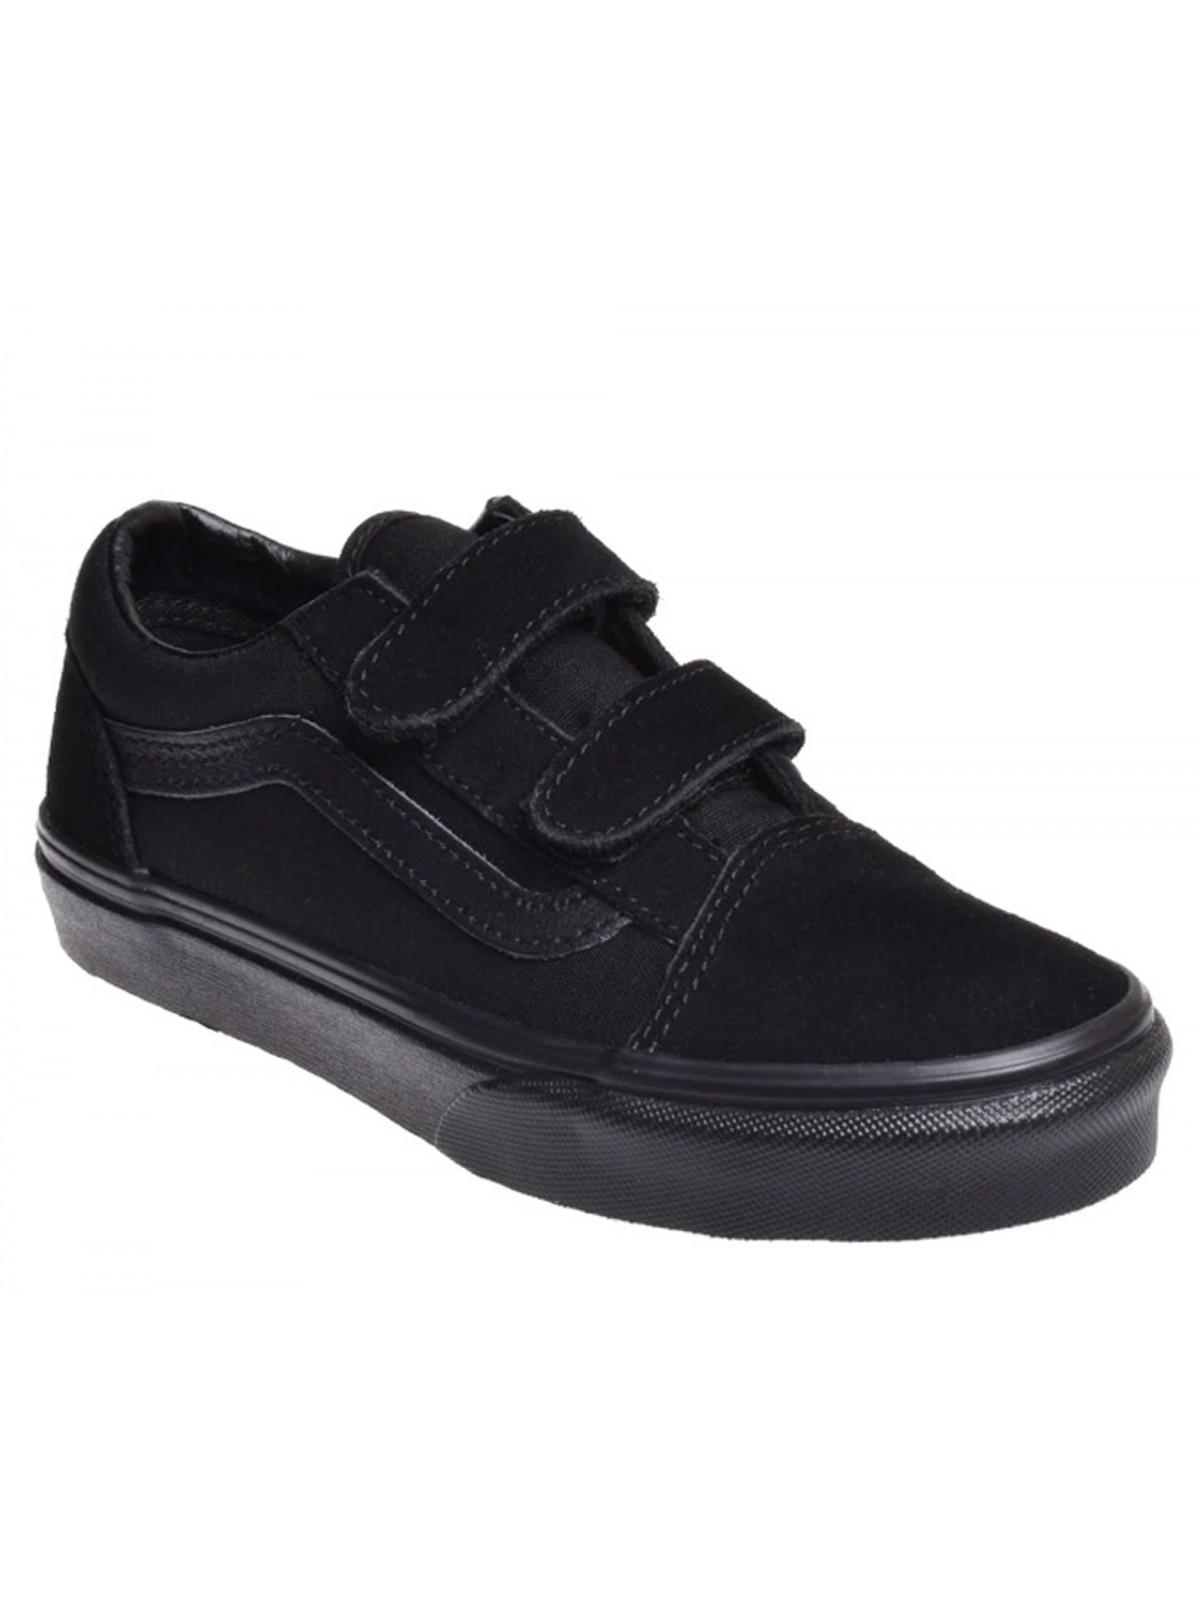 Vans Old Skool Velcro mono noir